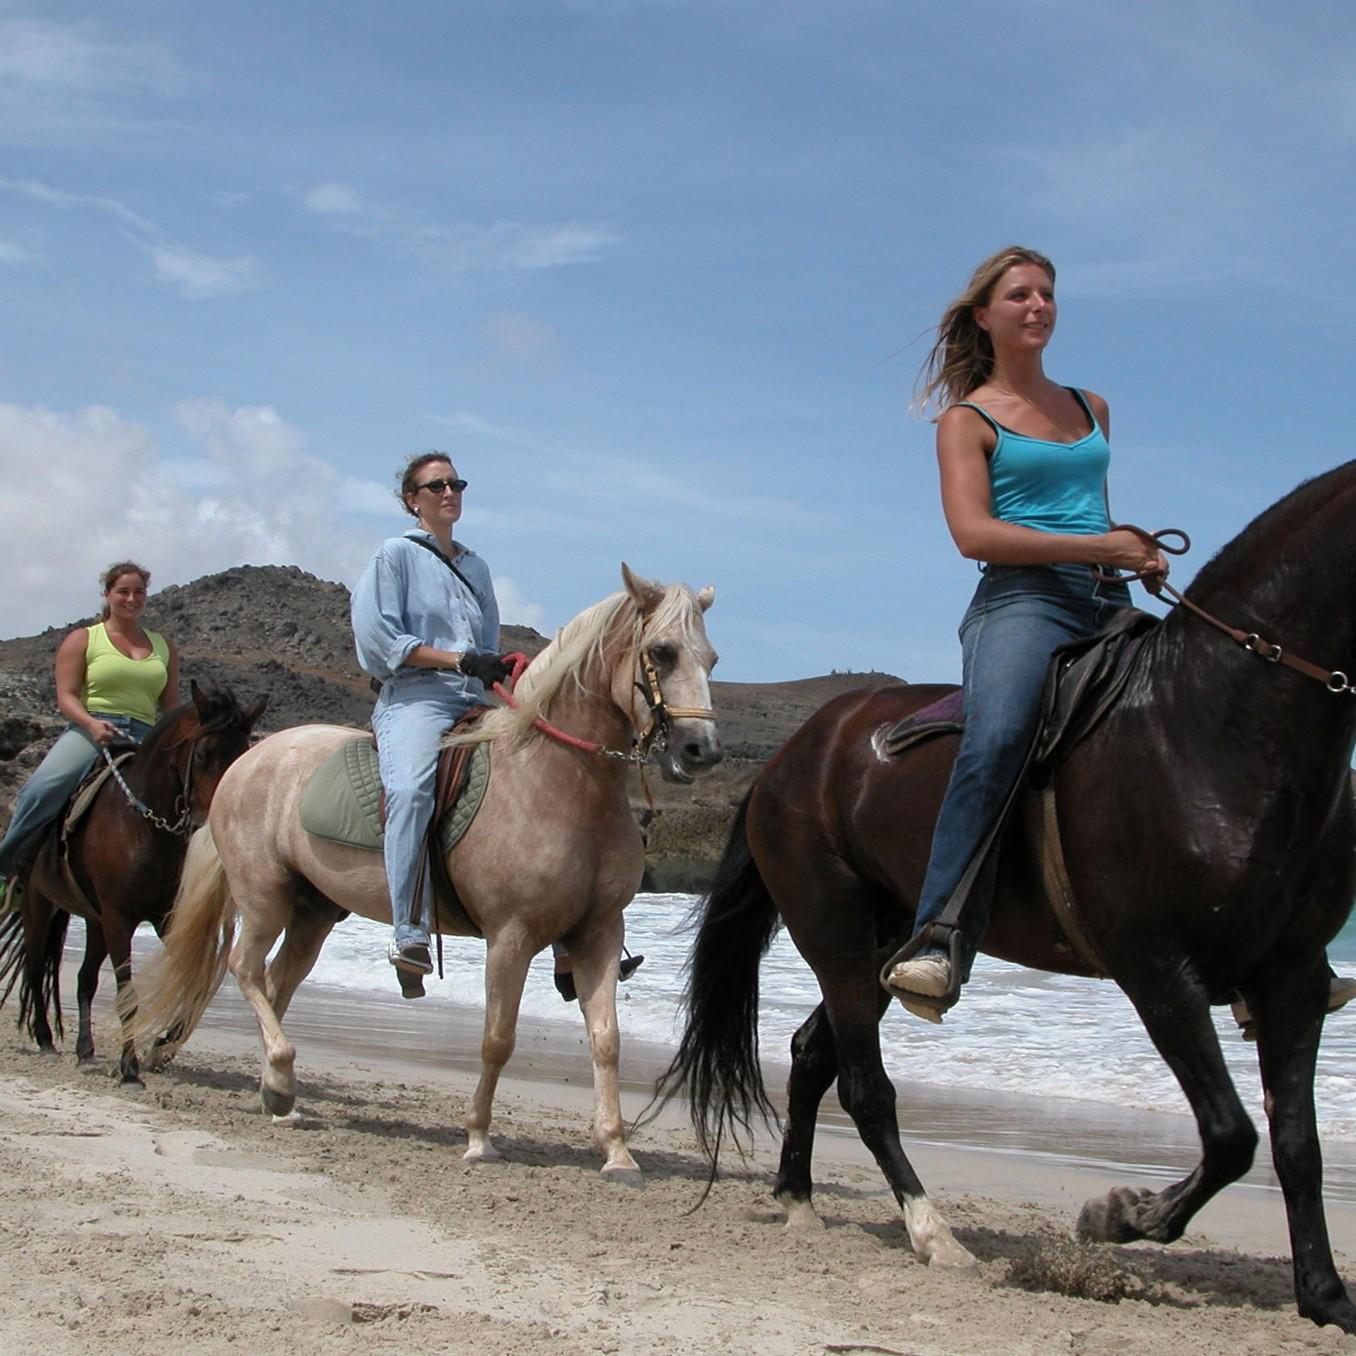 beach ride activity